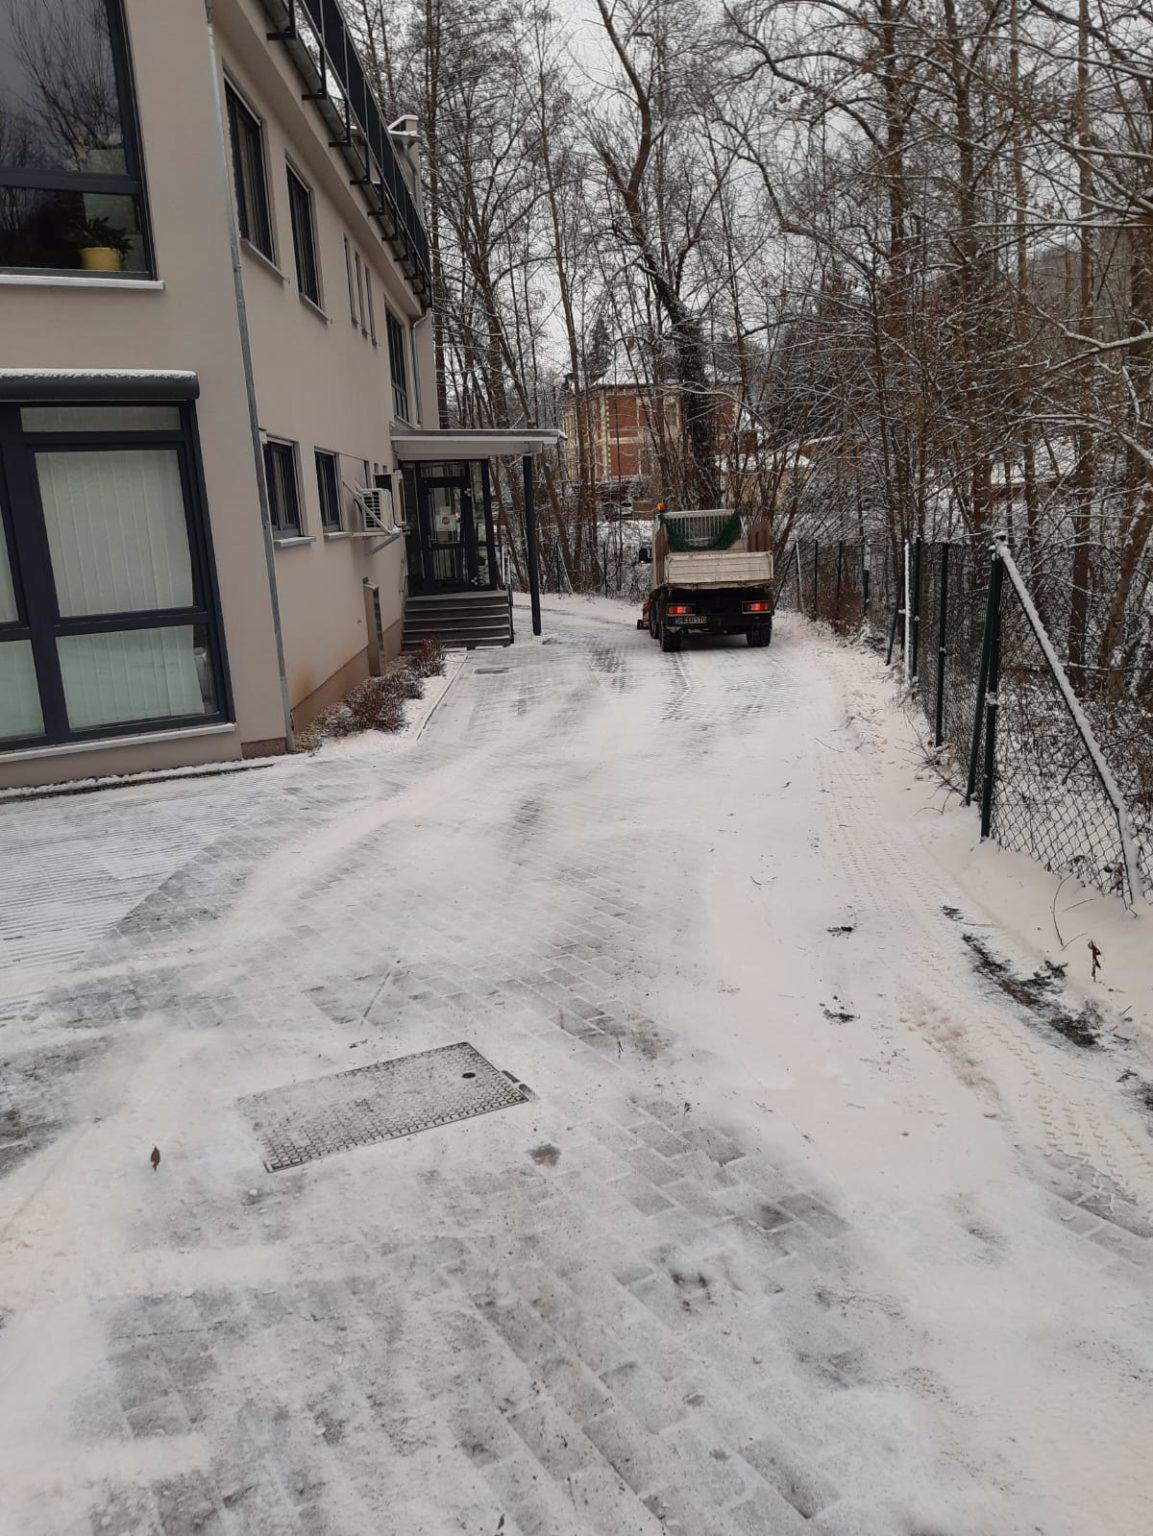 Winterdienst Stadtroda